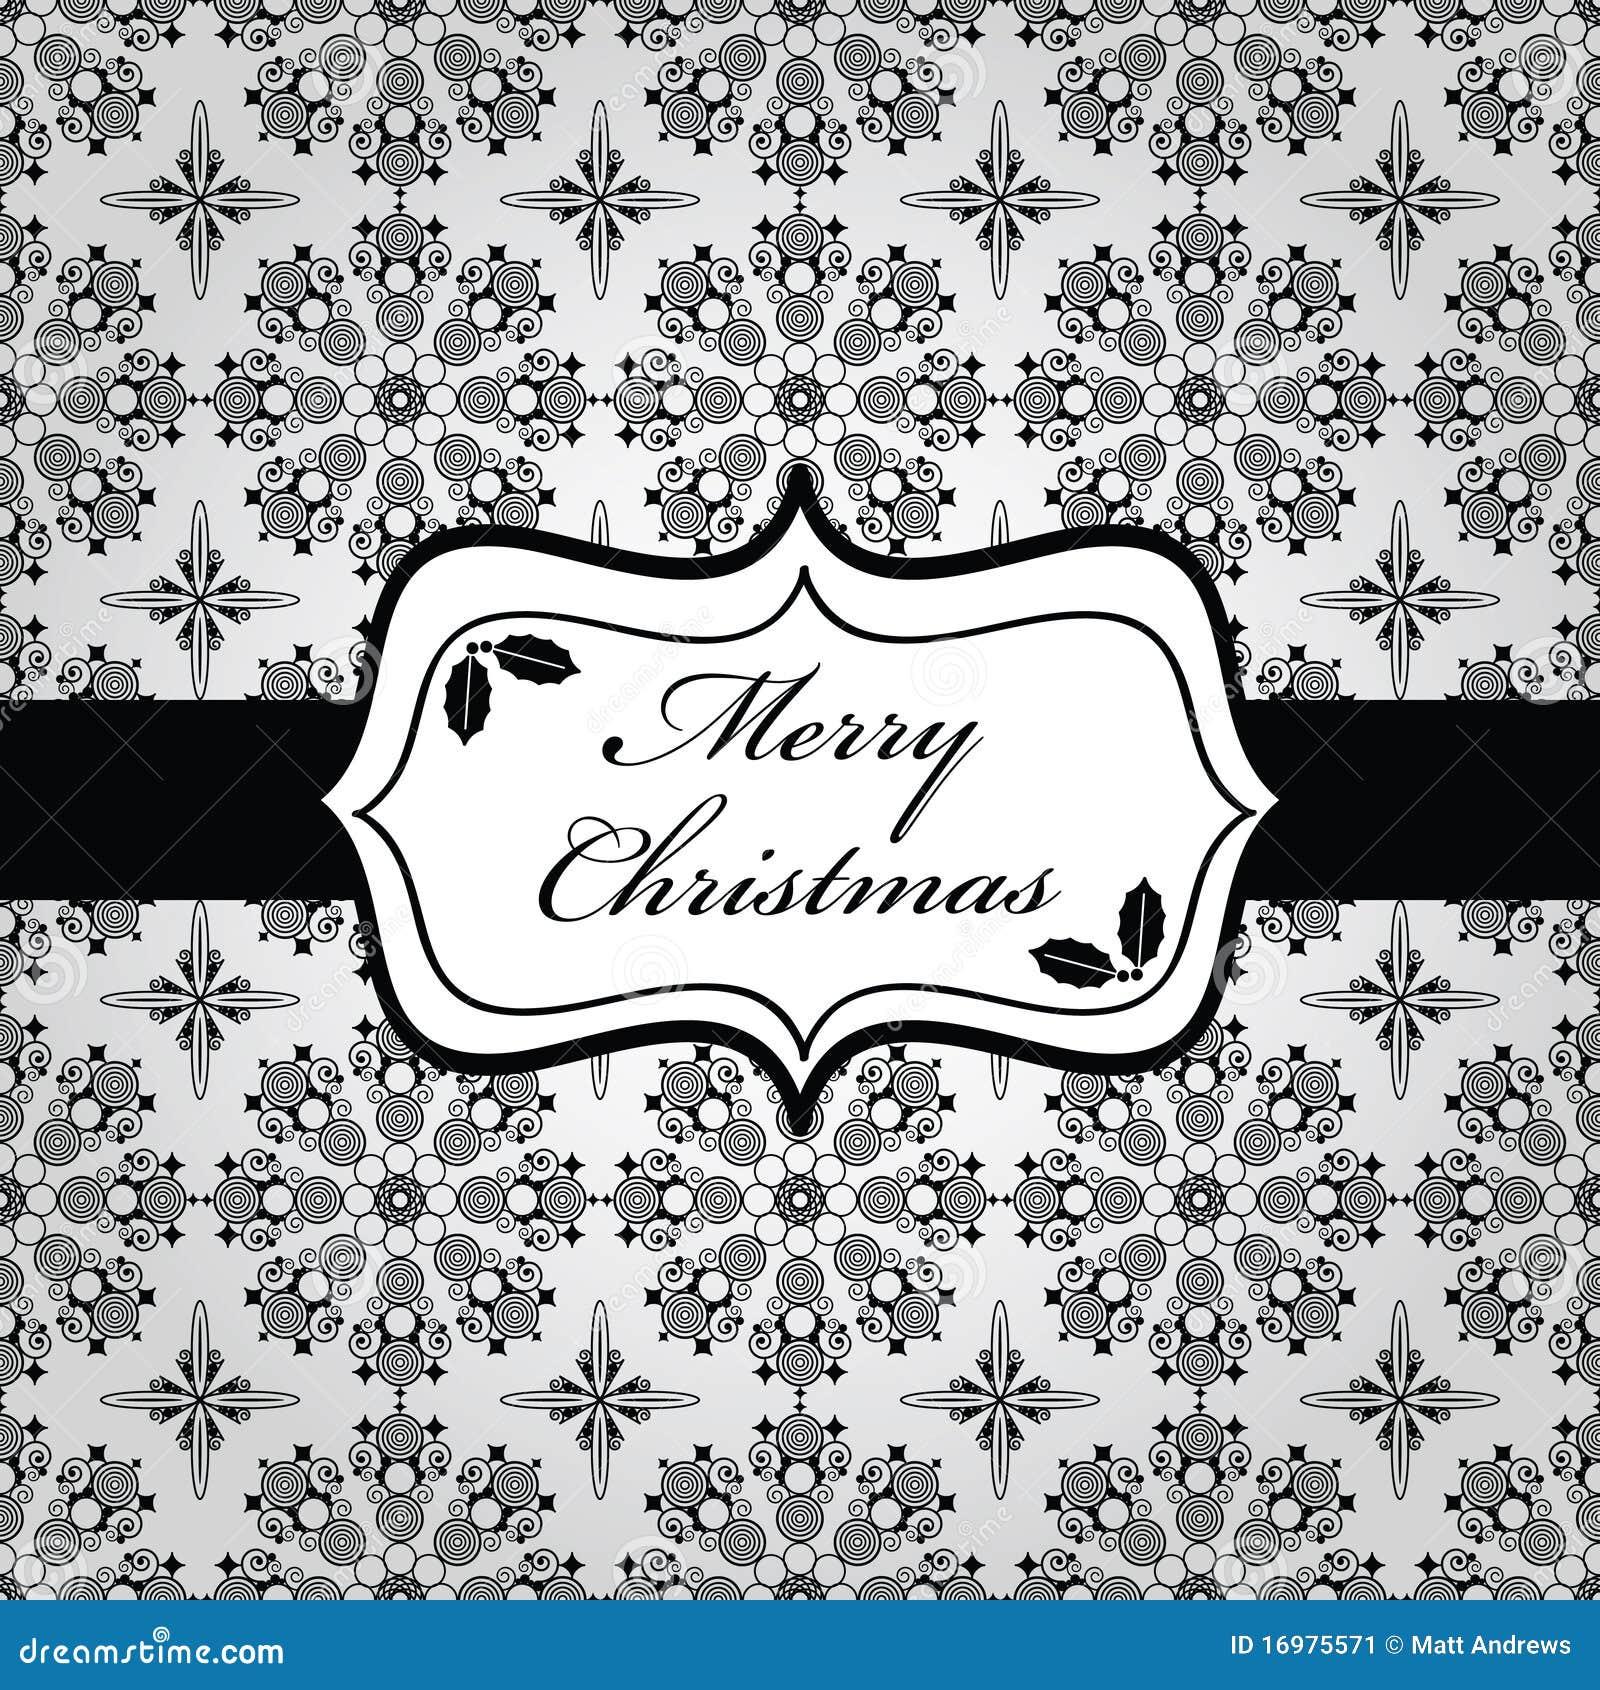 emballage noir et blanc de no l image stock image 16975571. Black Bedroom Furniture Sets. Home Design Ideas